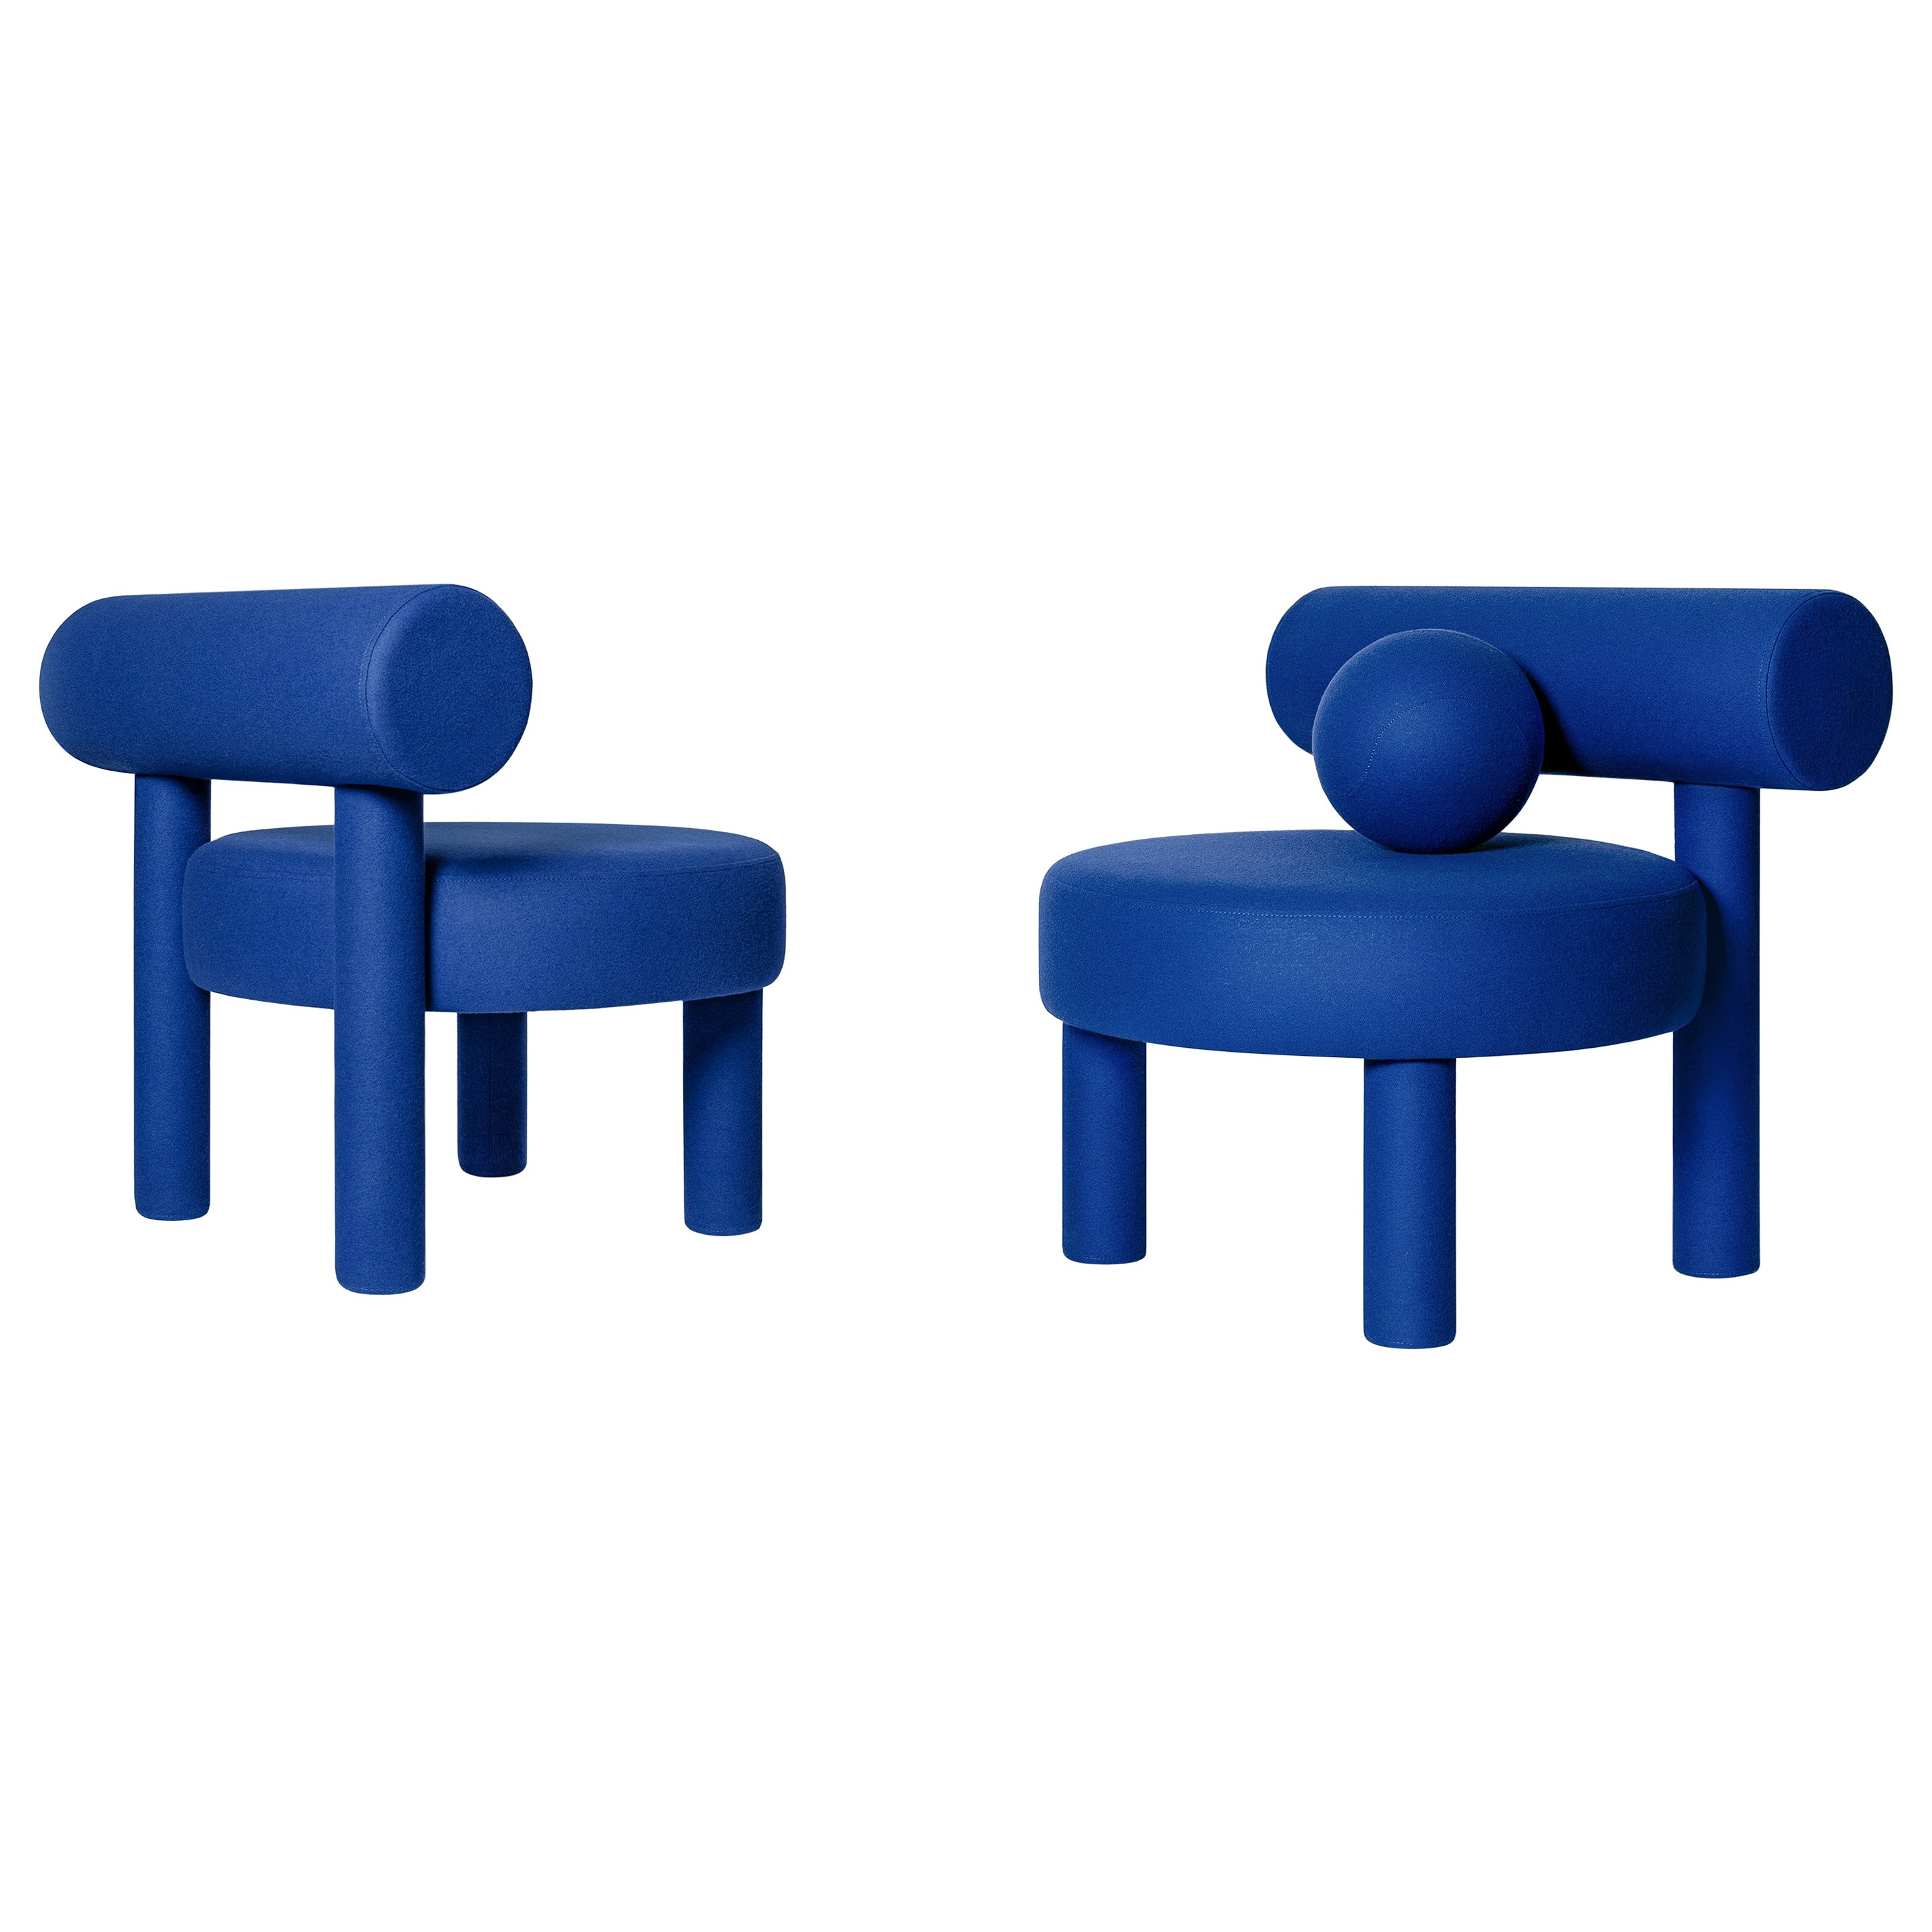 Set of Two Modern Low Chair Gropius CS1 in Fire Retardant Wool by NOOM